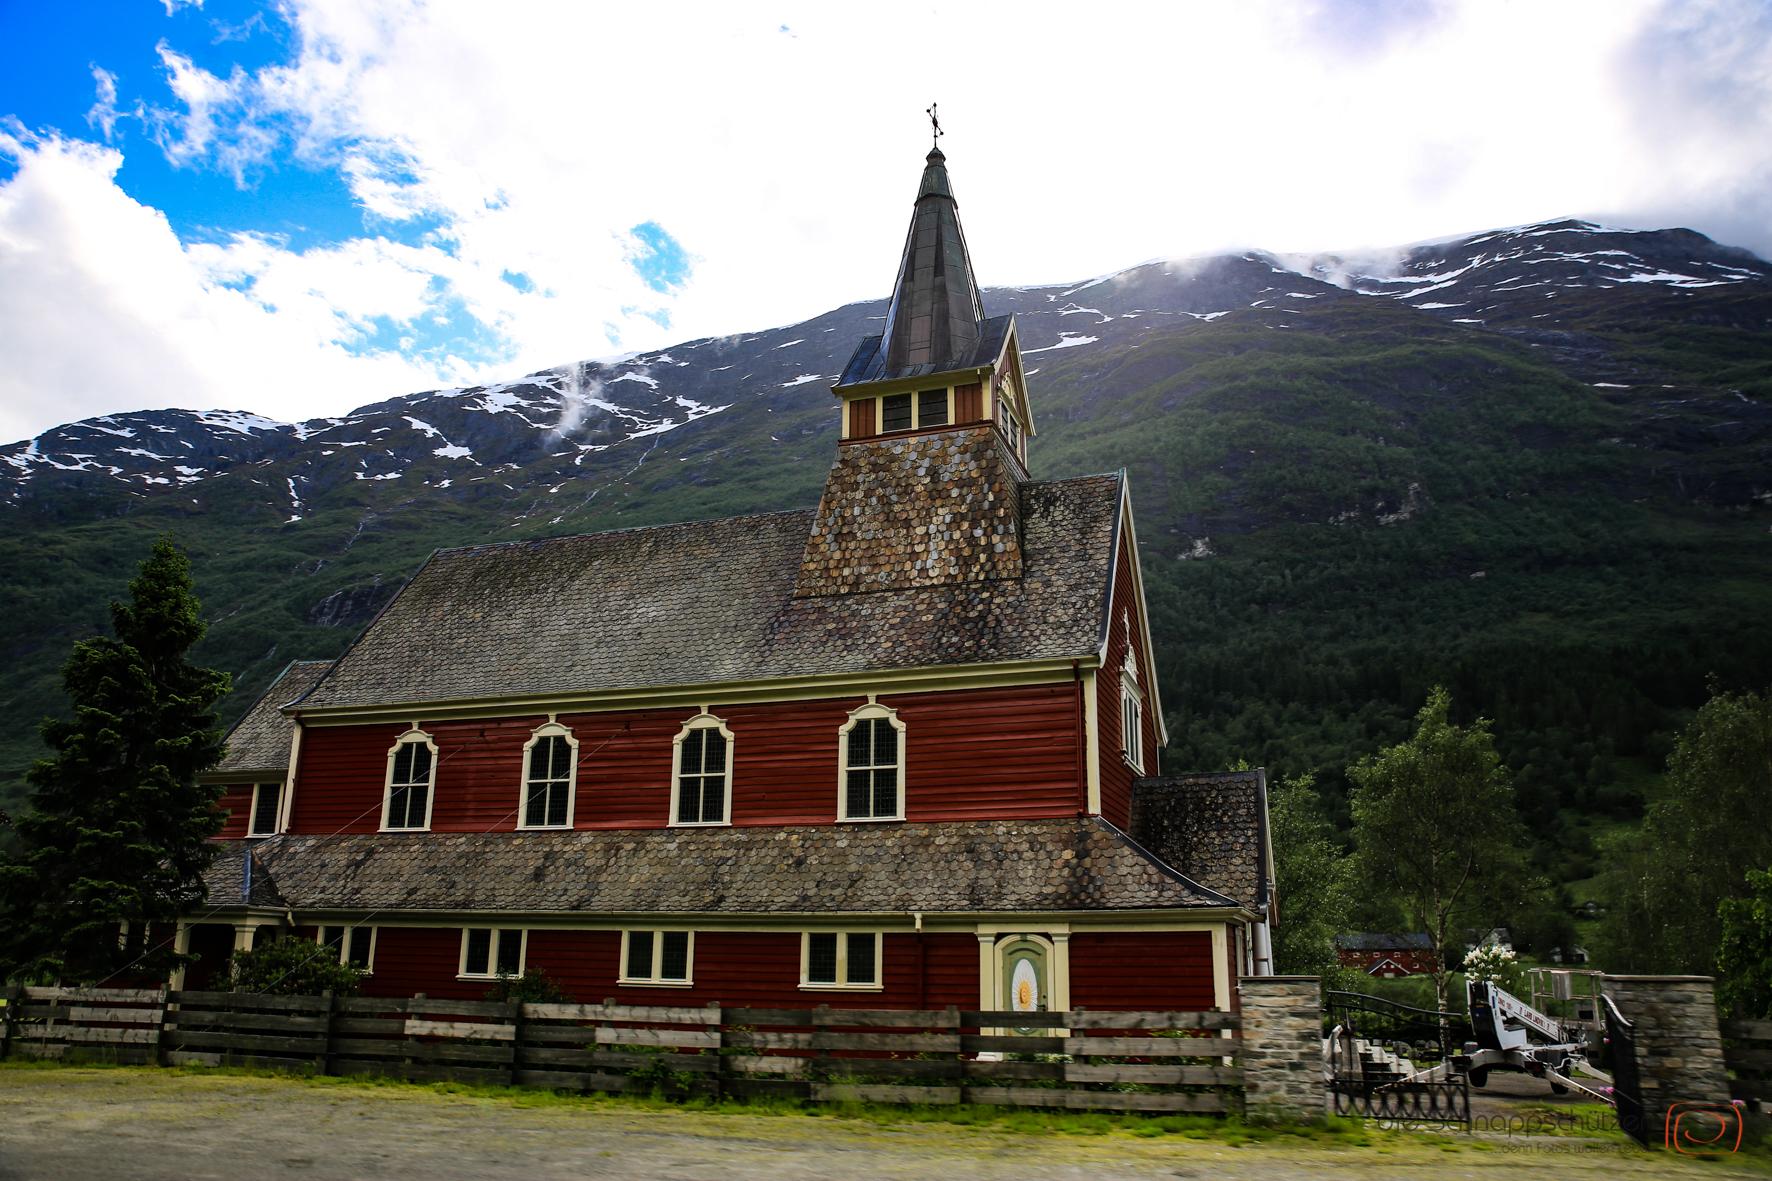 Holzkirche bei Olden